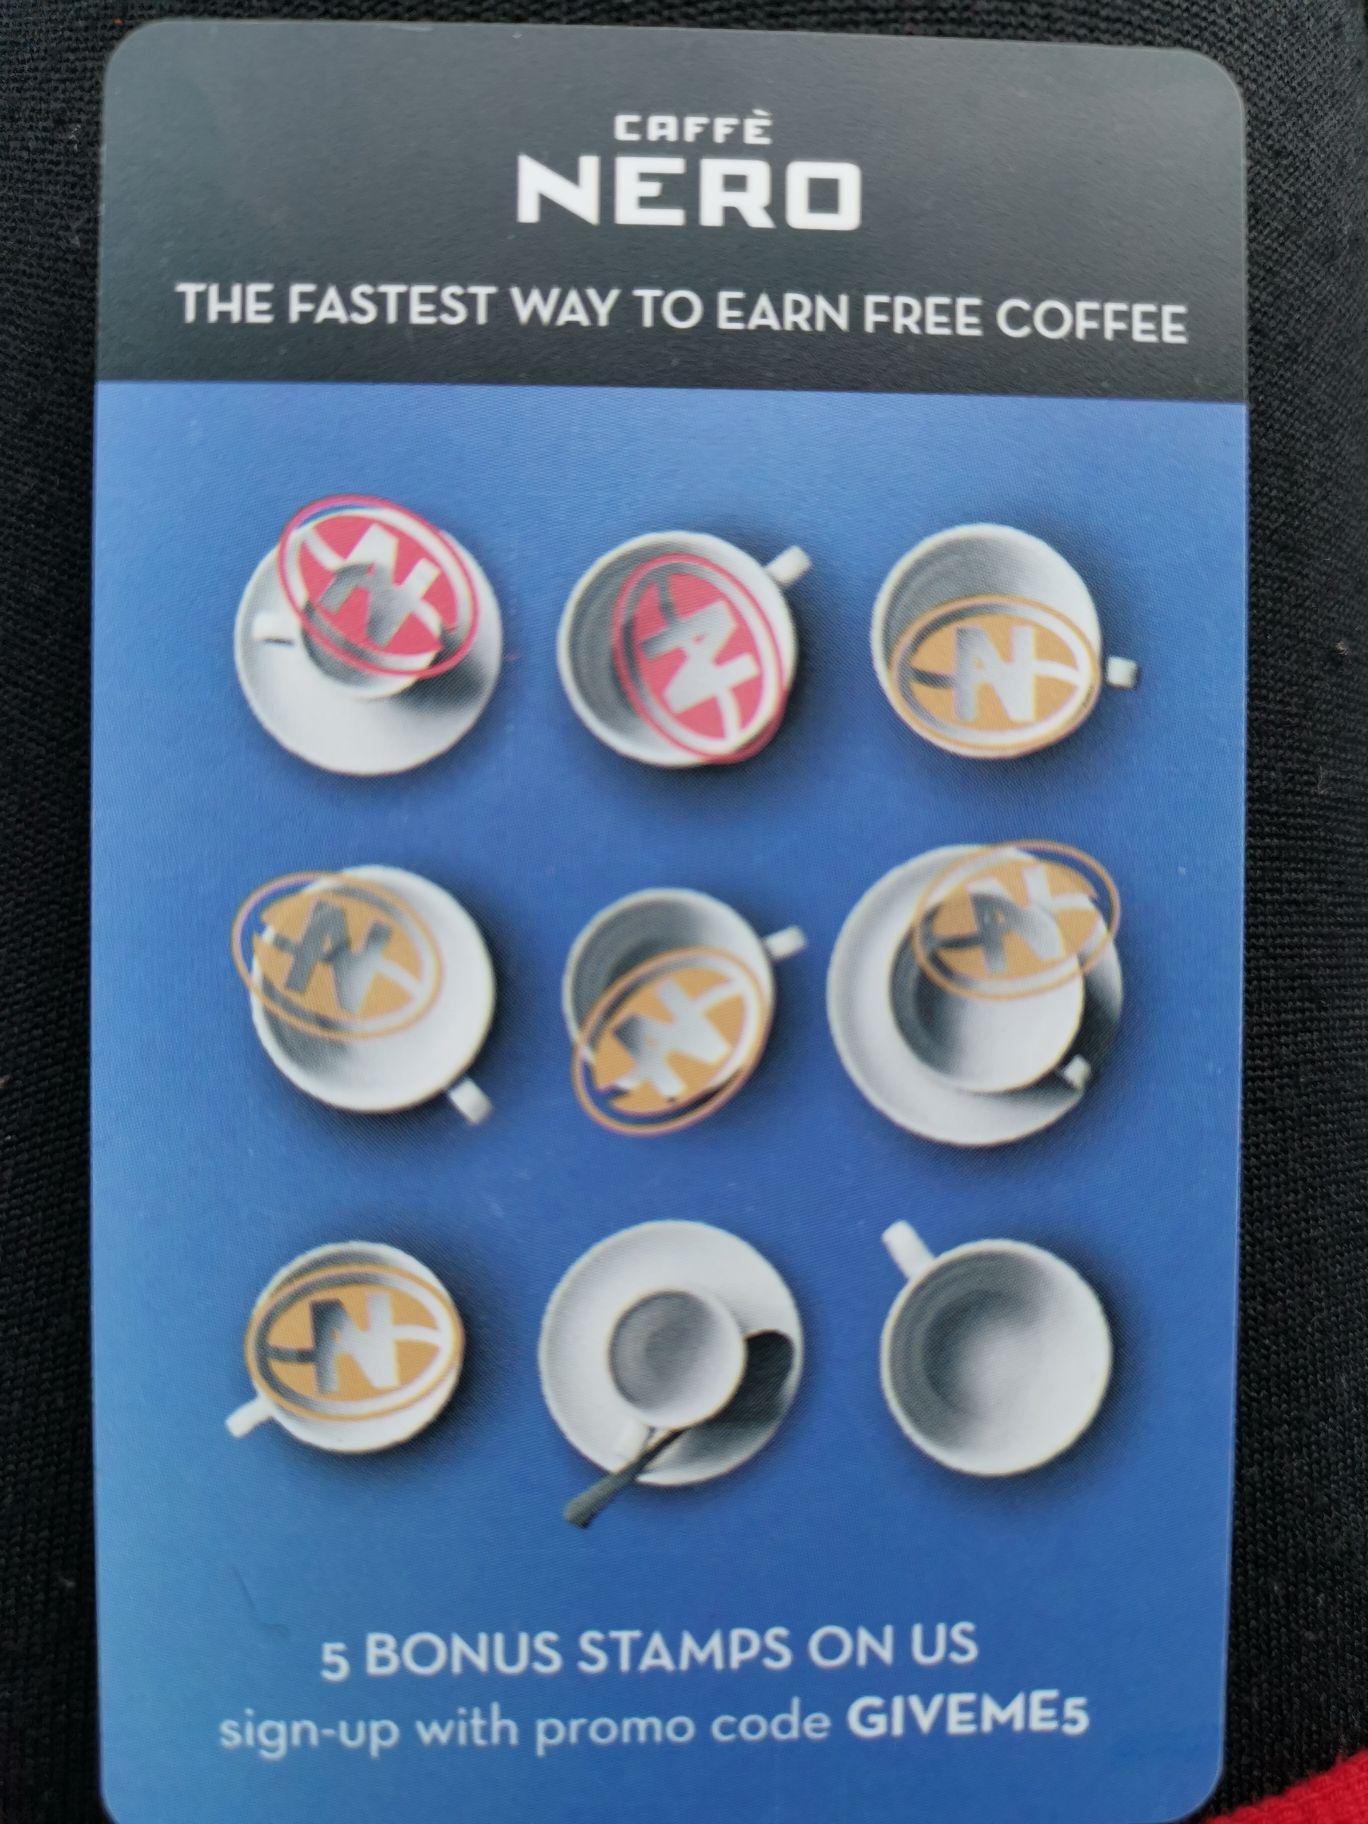 Caffè Nero 5 bonus stamps with promo code, new app/customer